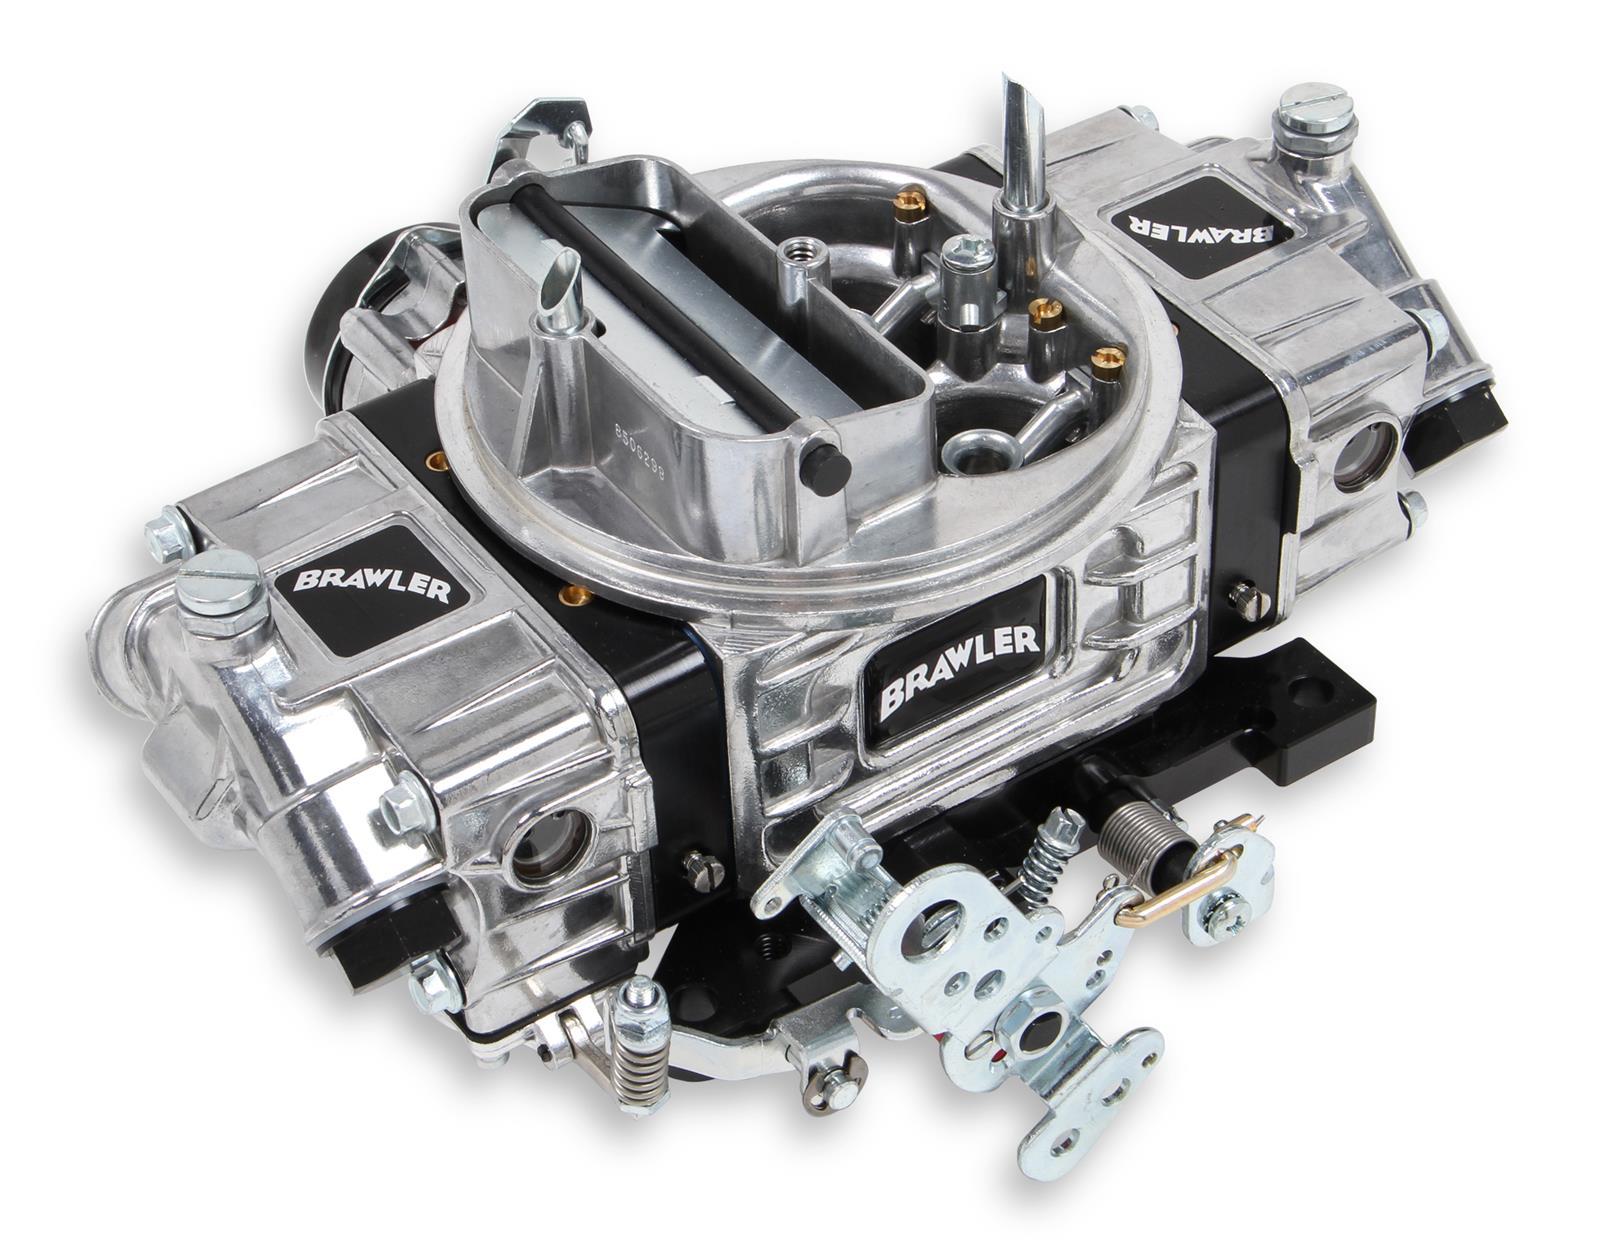 Proform 67214 Street Series 850 CFM Polished Aluminum Dual Inlet 4-Barrel Square Bore Mechanical Secondary Carburetor with Electric Choke